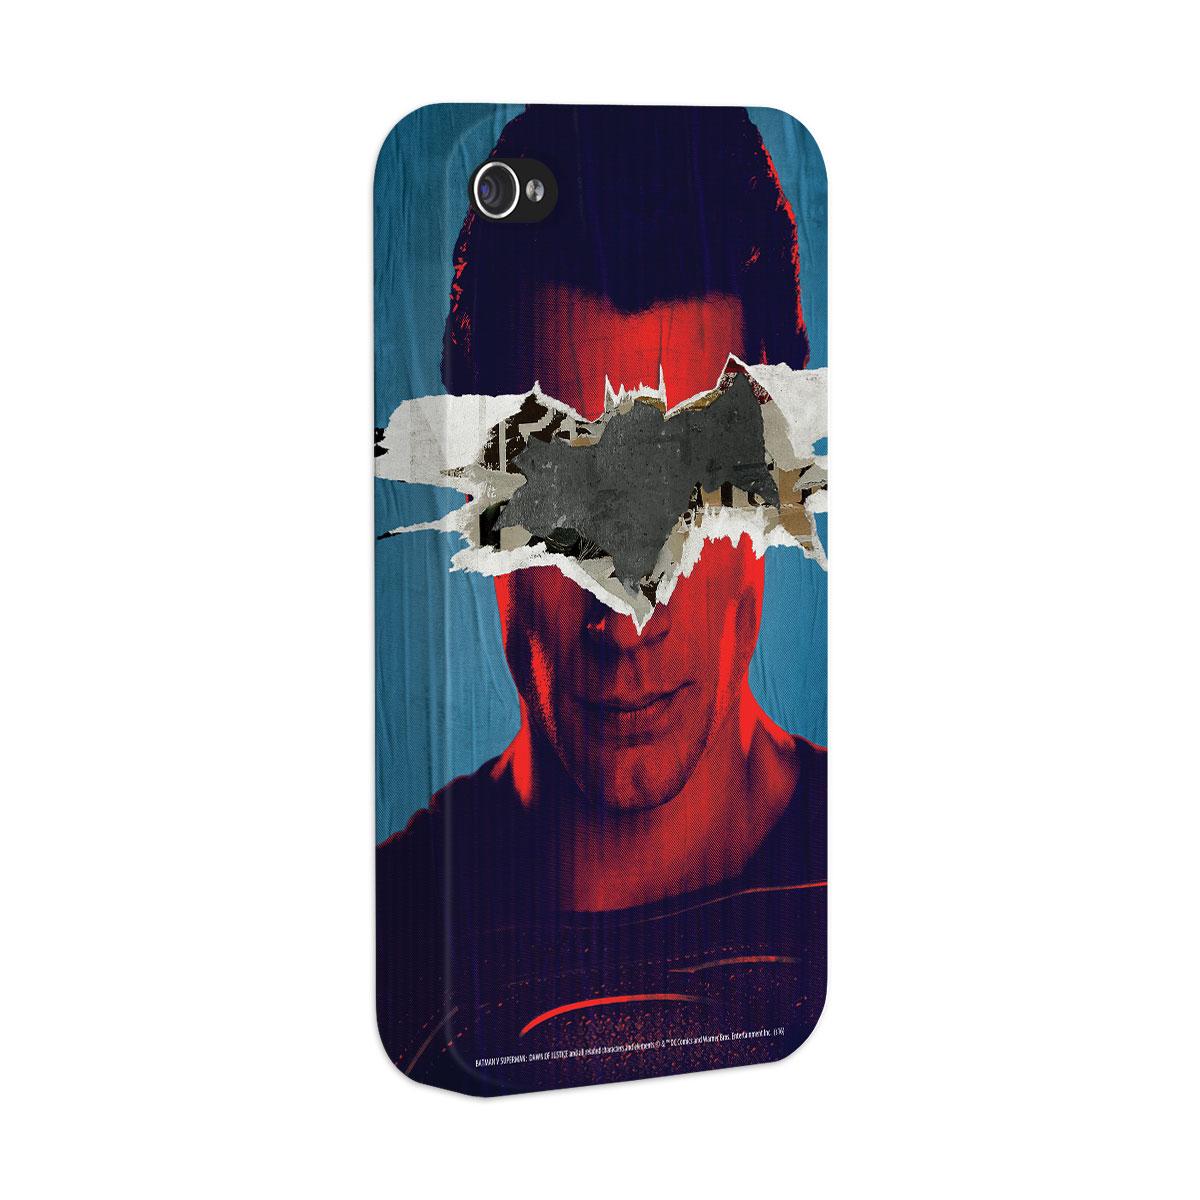 Capa para iPhone 4/4S Batman VS Superman Man VS God  - bandUP Store Marketplace